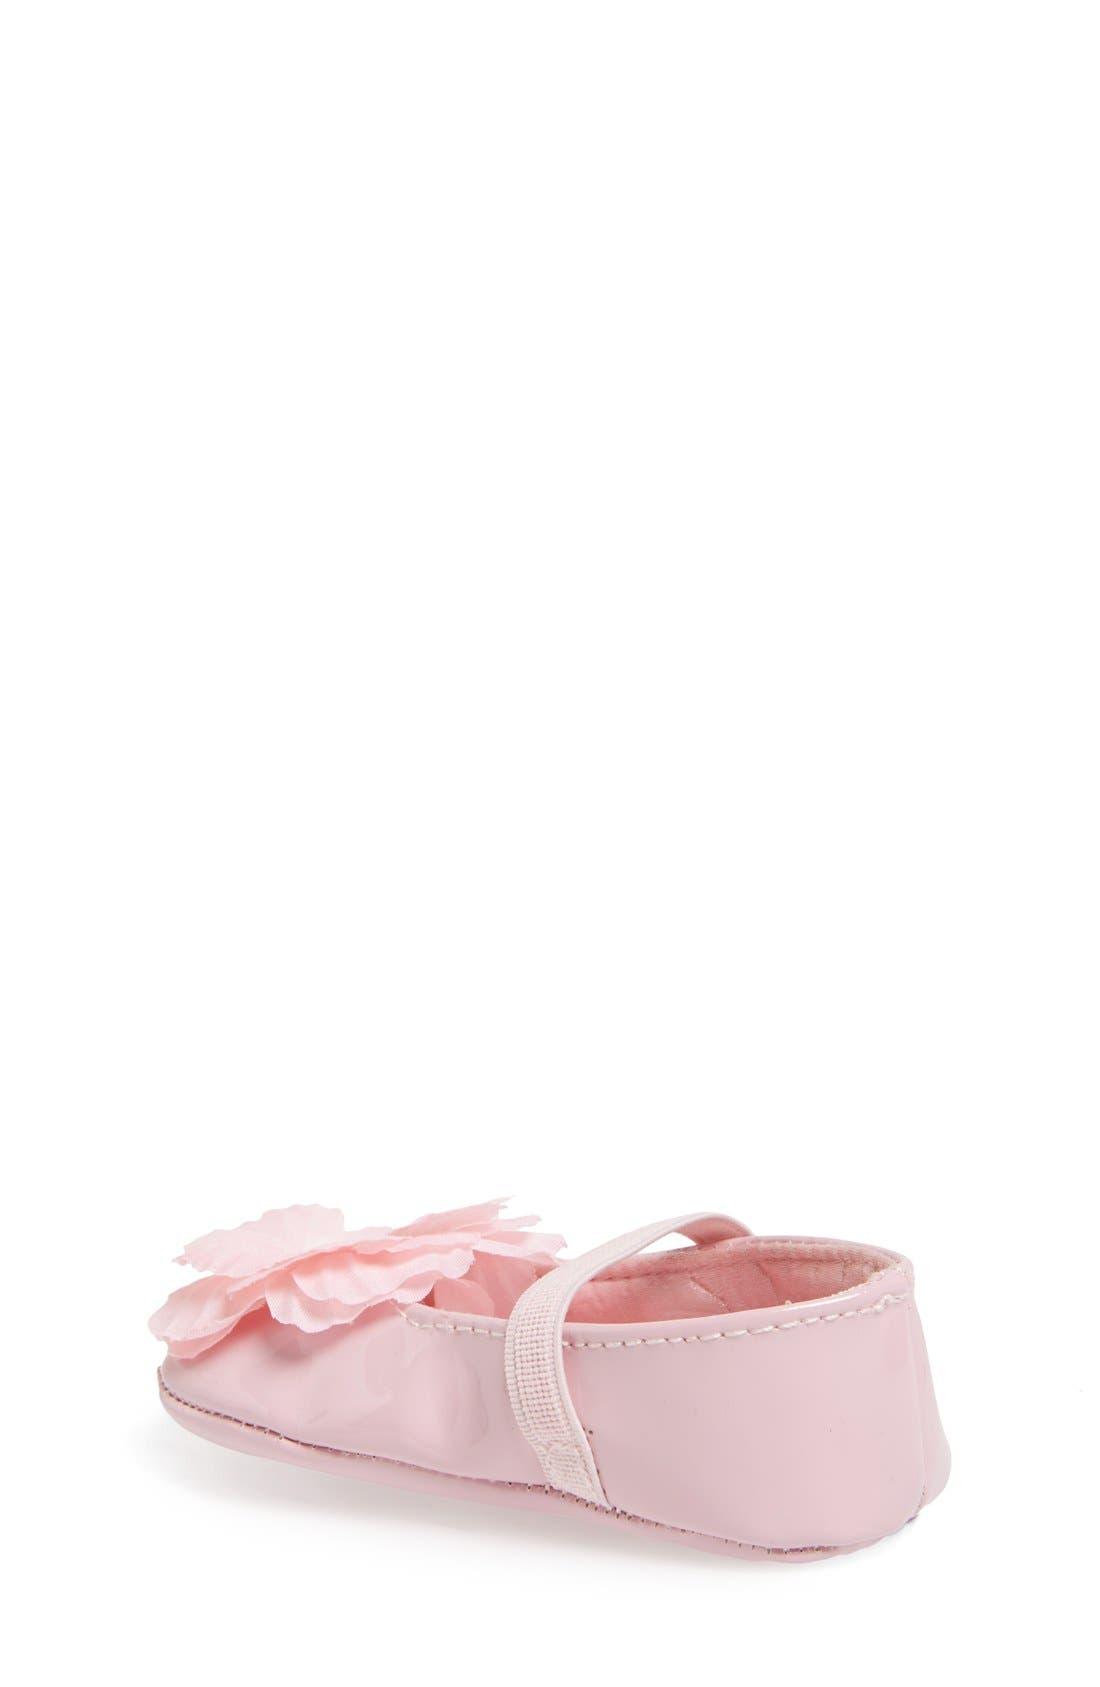 'Baby Bud' Crib Shoe,                             Alternate thumbnail 8, color,